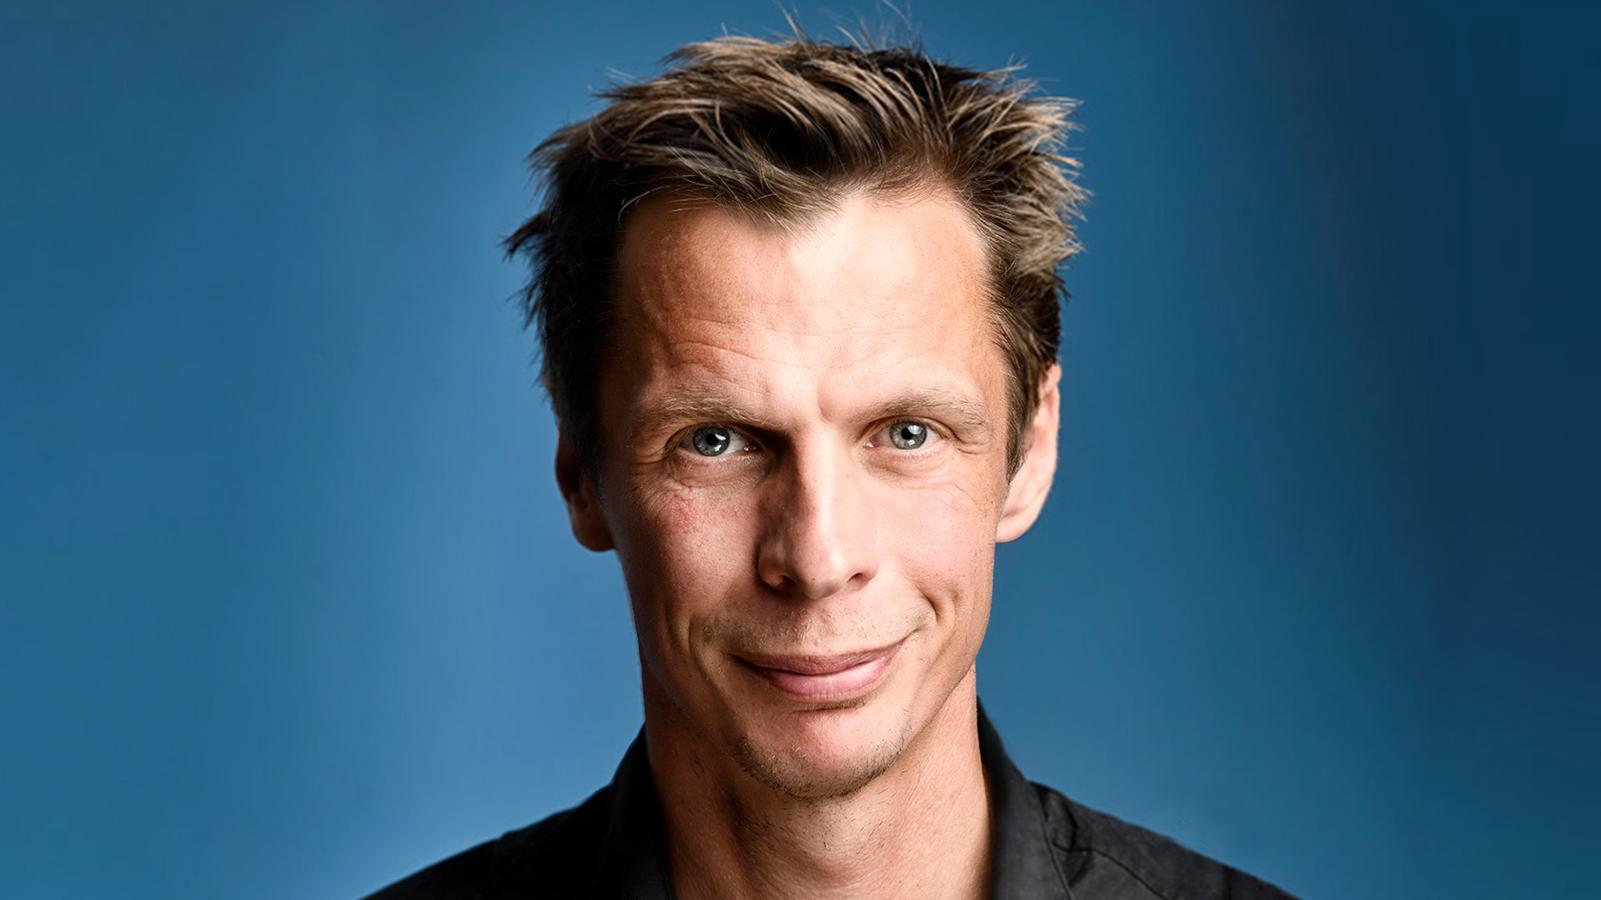 Klaus Eckel